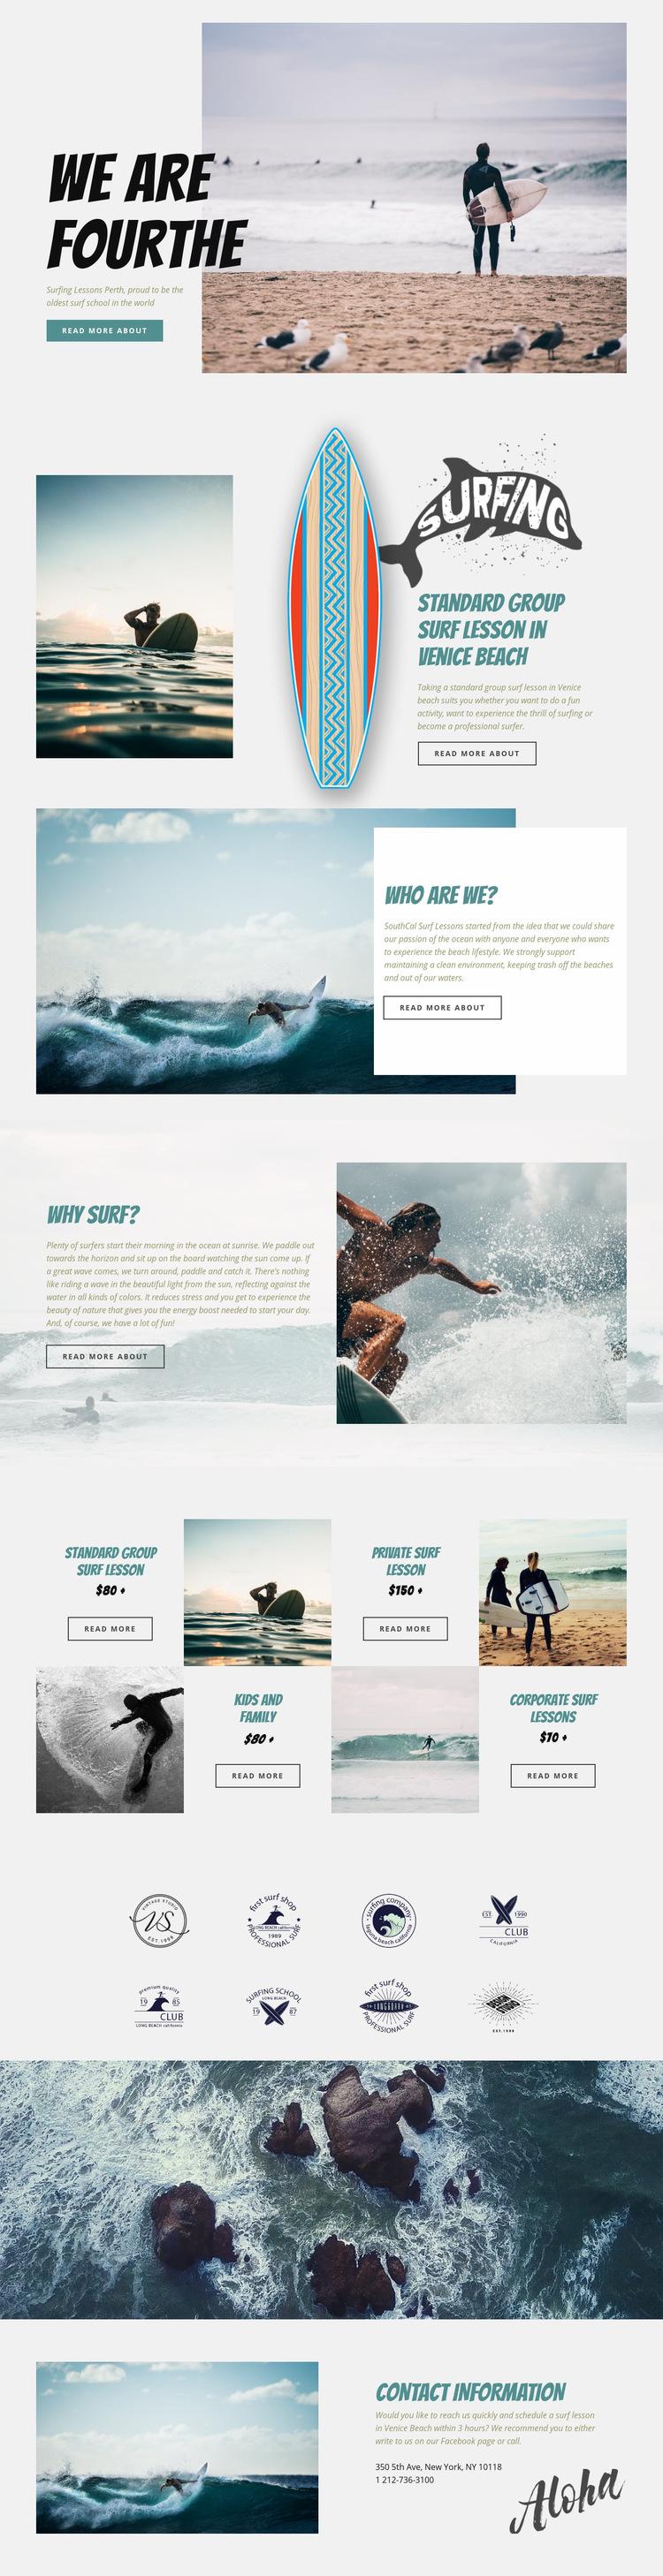 Surfing Web Page Design